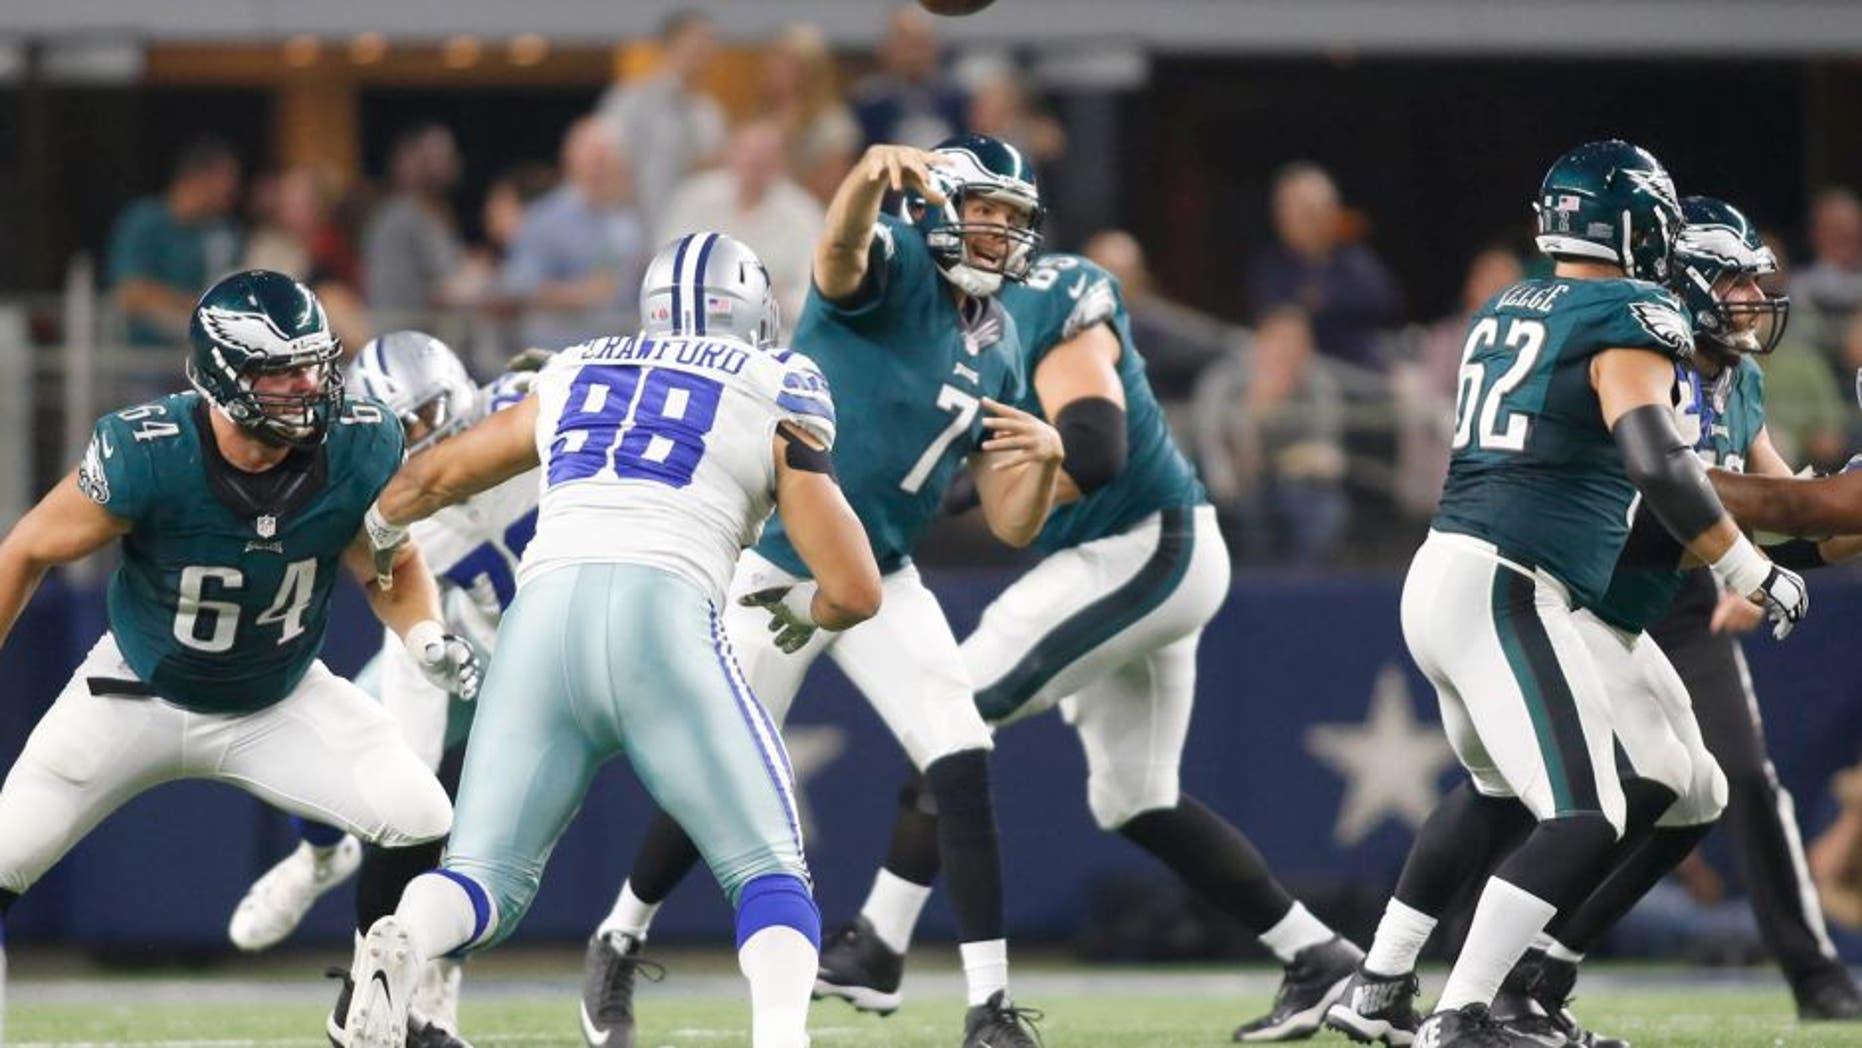 Nov 8, 2015; Arlington, TX, USA; Philadelphia Eagles quarterback Sam Bradford (7) throws a pass in the second quarter against the Dallas Cowboys at AT&T Stadium. Mandatory Credit: Tim Heitman-USA TODAY Sports